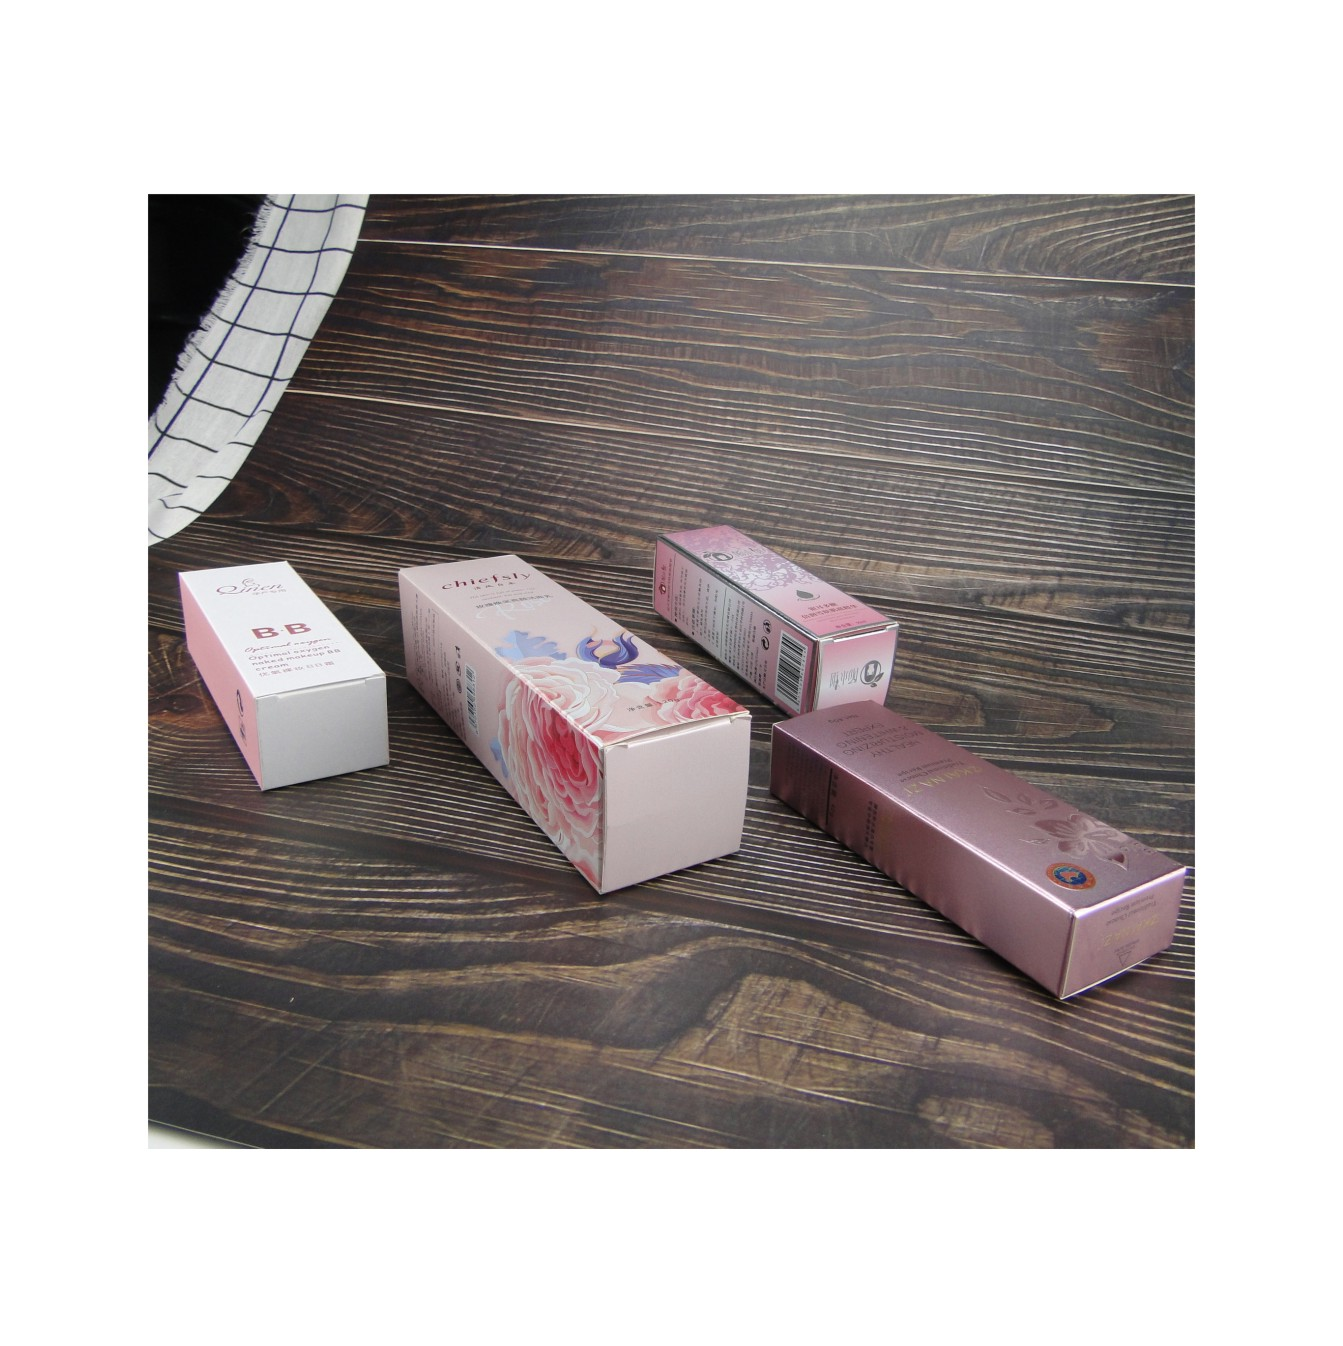 Fragile Sticker Adhesive Fragile Shipping Sticker Ultra